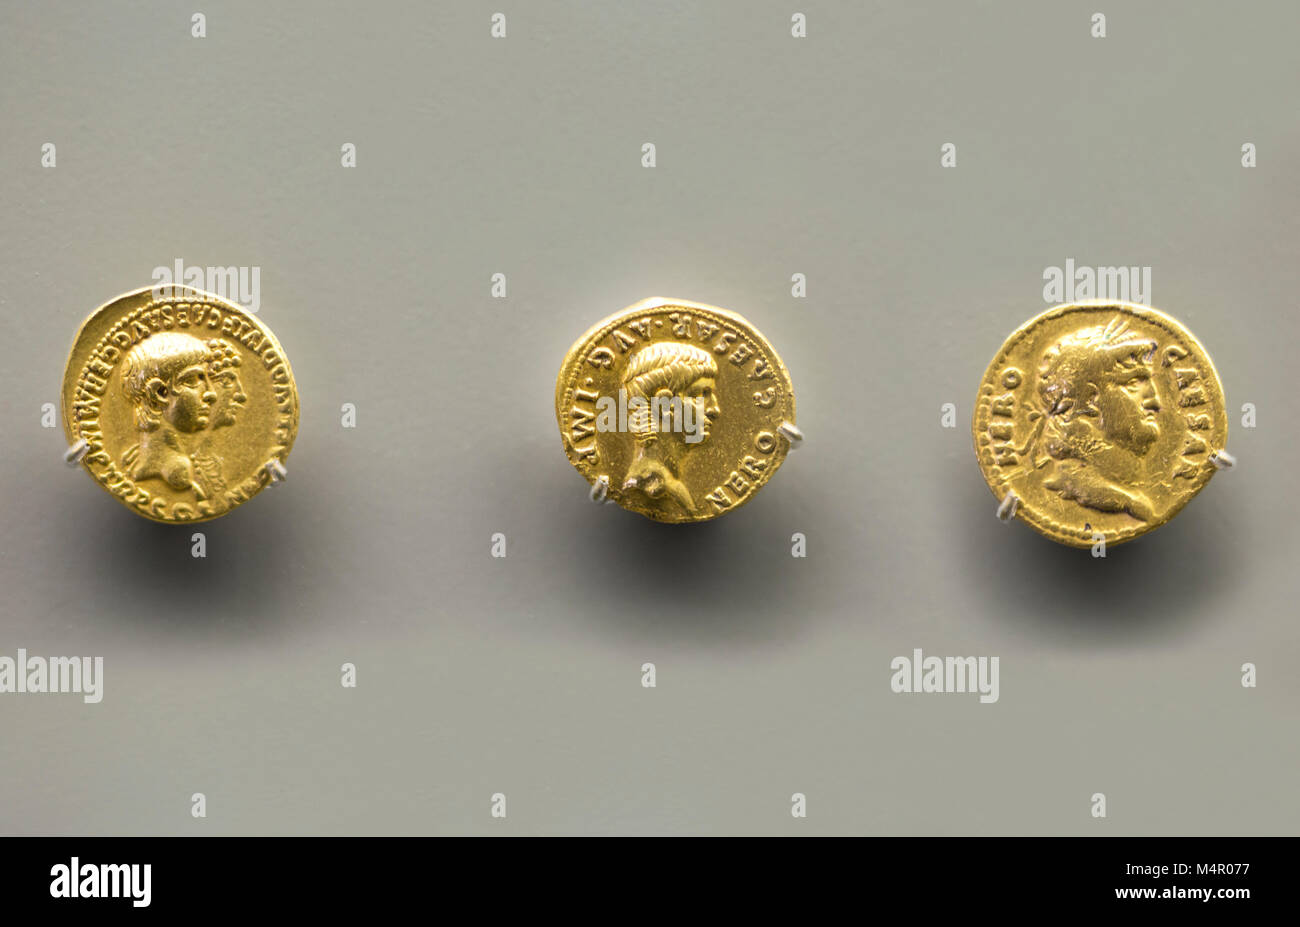 Merida, Spain - December 20th, 2017: Three golden coins of Nero Emperor at National Museum of Roman Art in Merida, - Stock Image